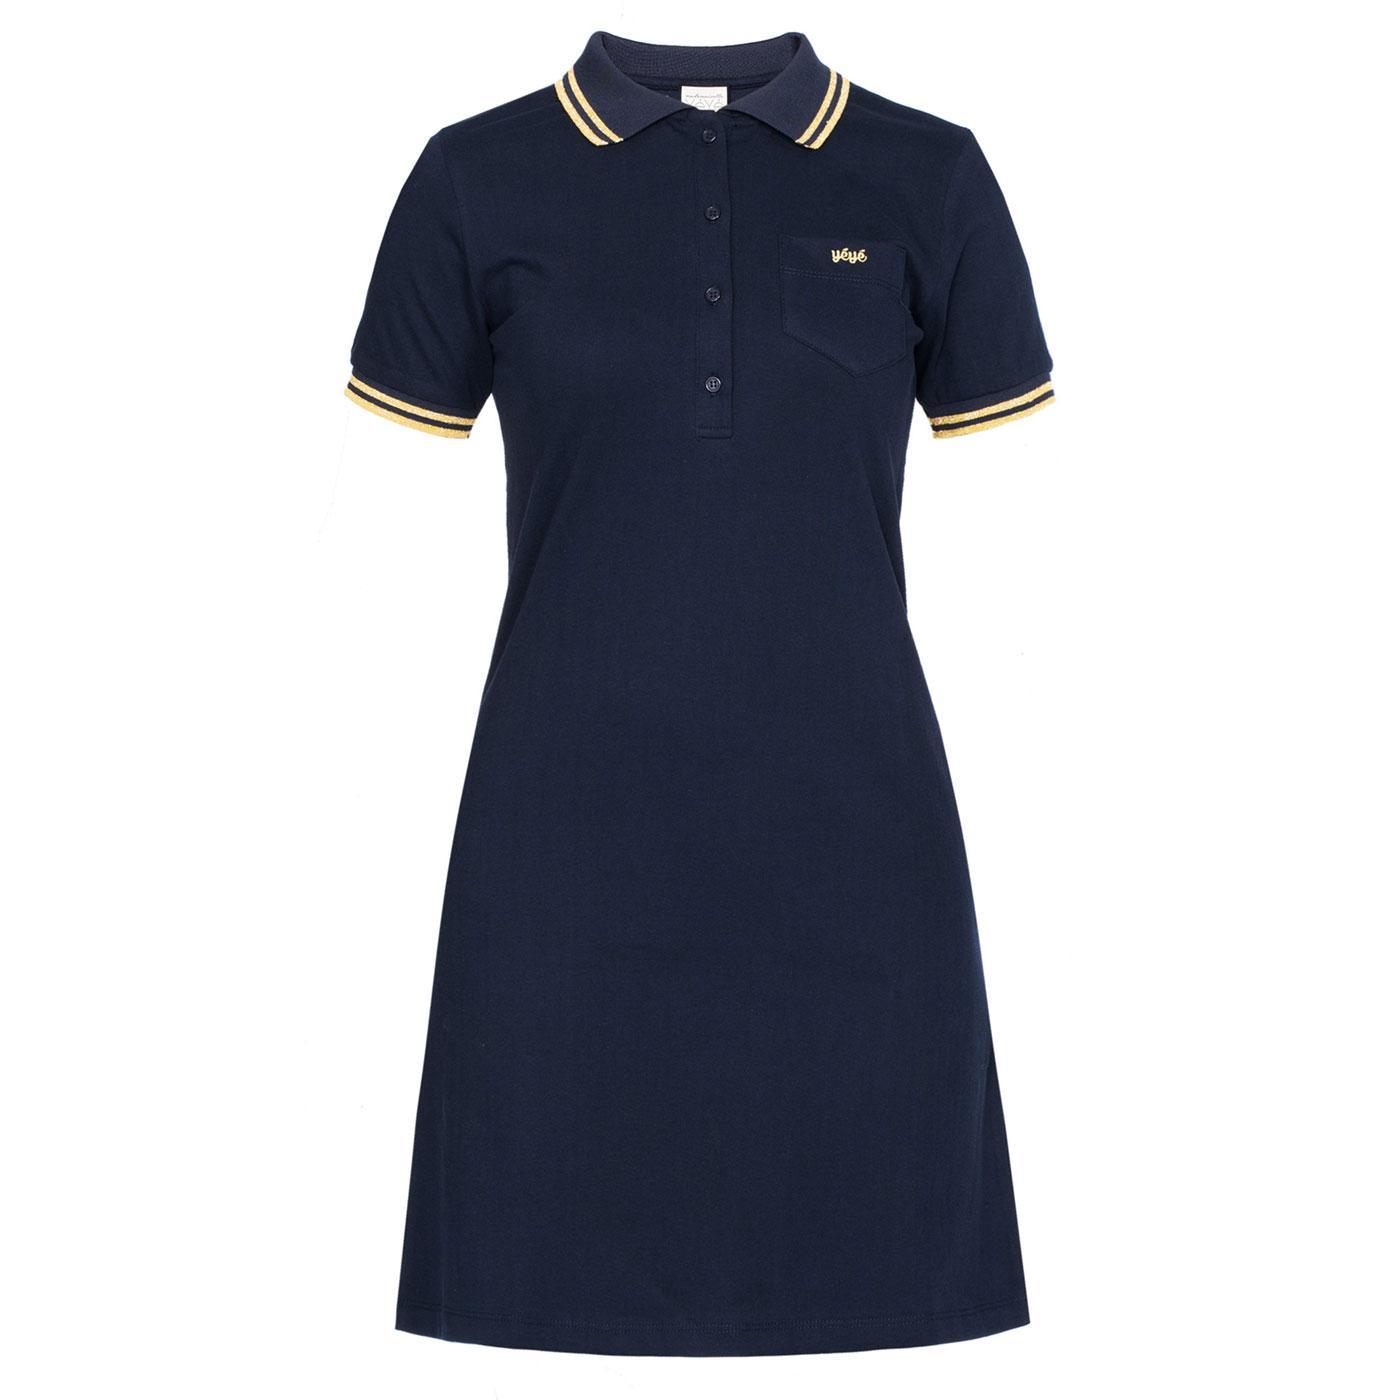 Rocksteady MADEMOISELLE YEYE 60s Mod Polo Dress